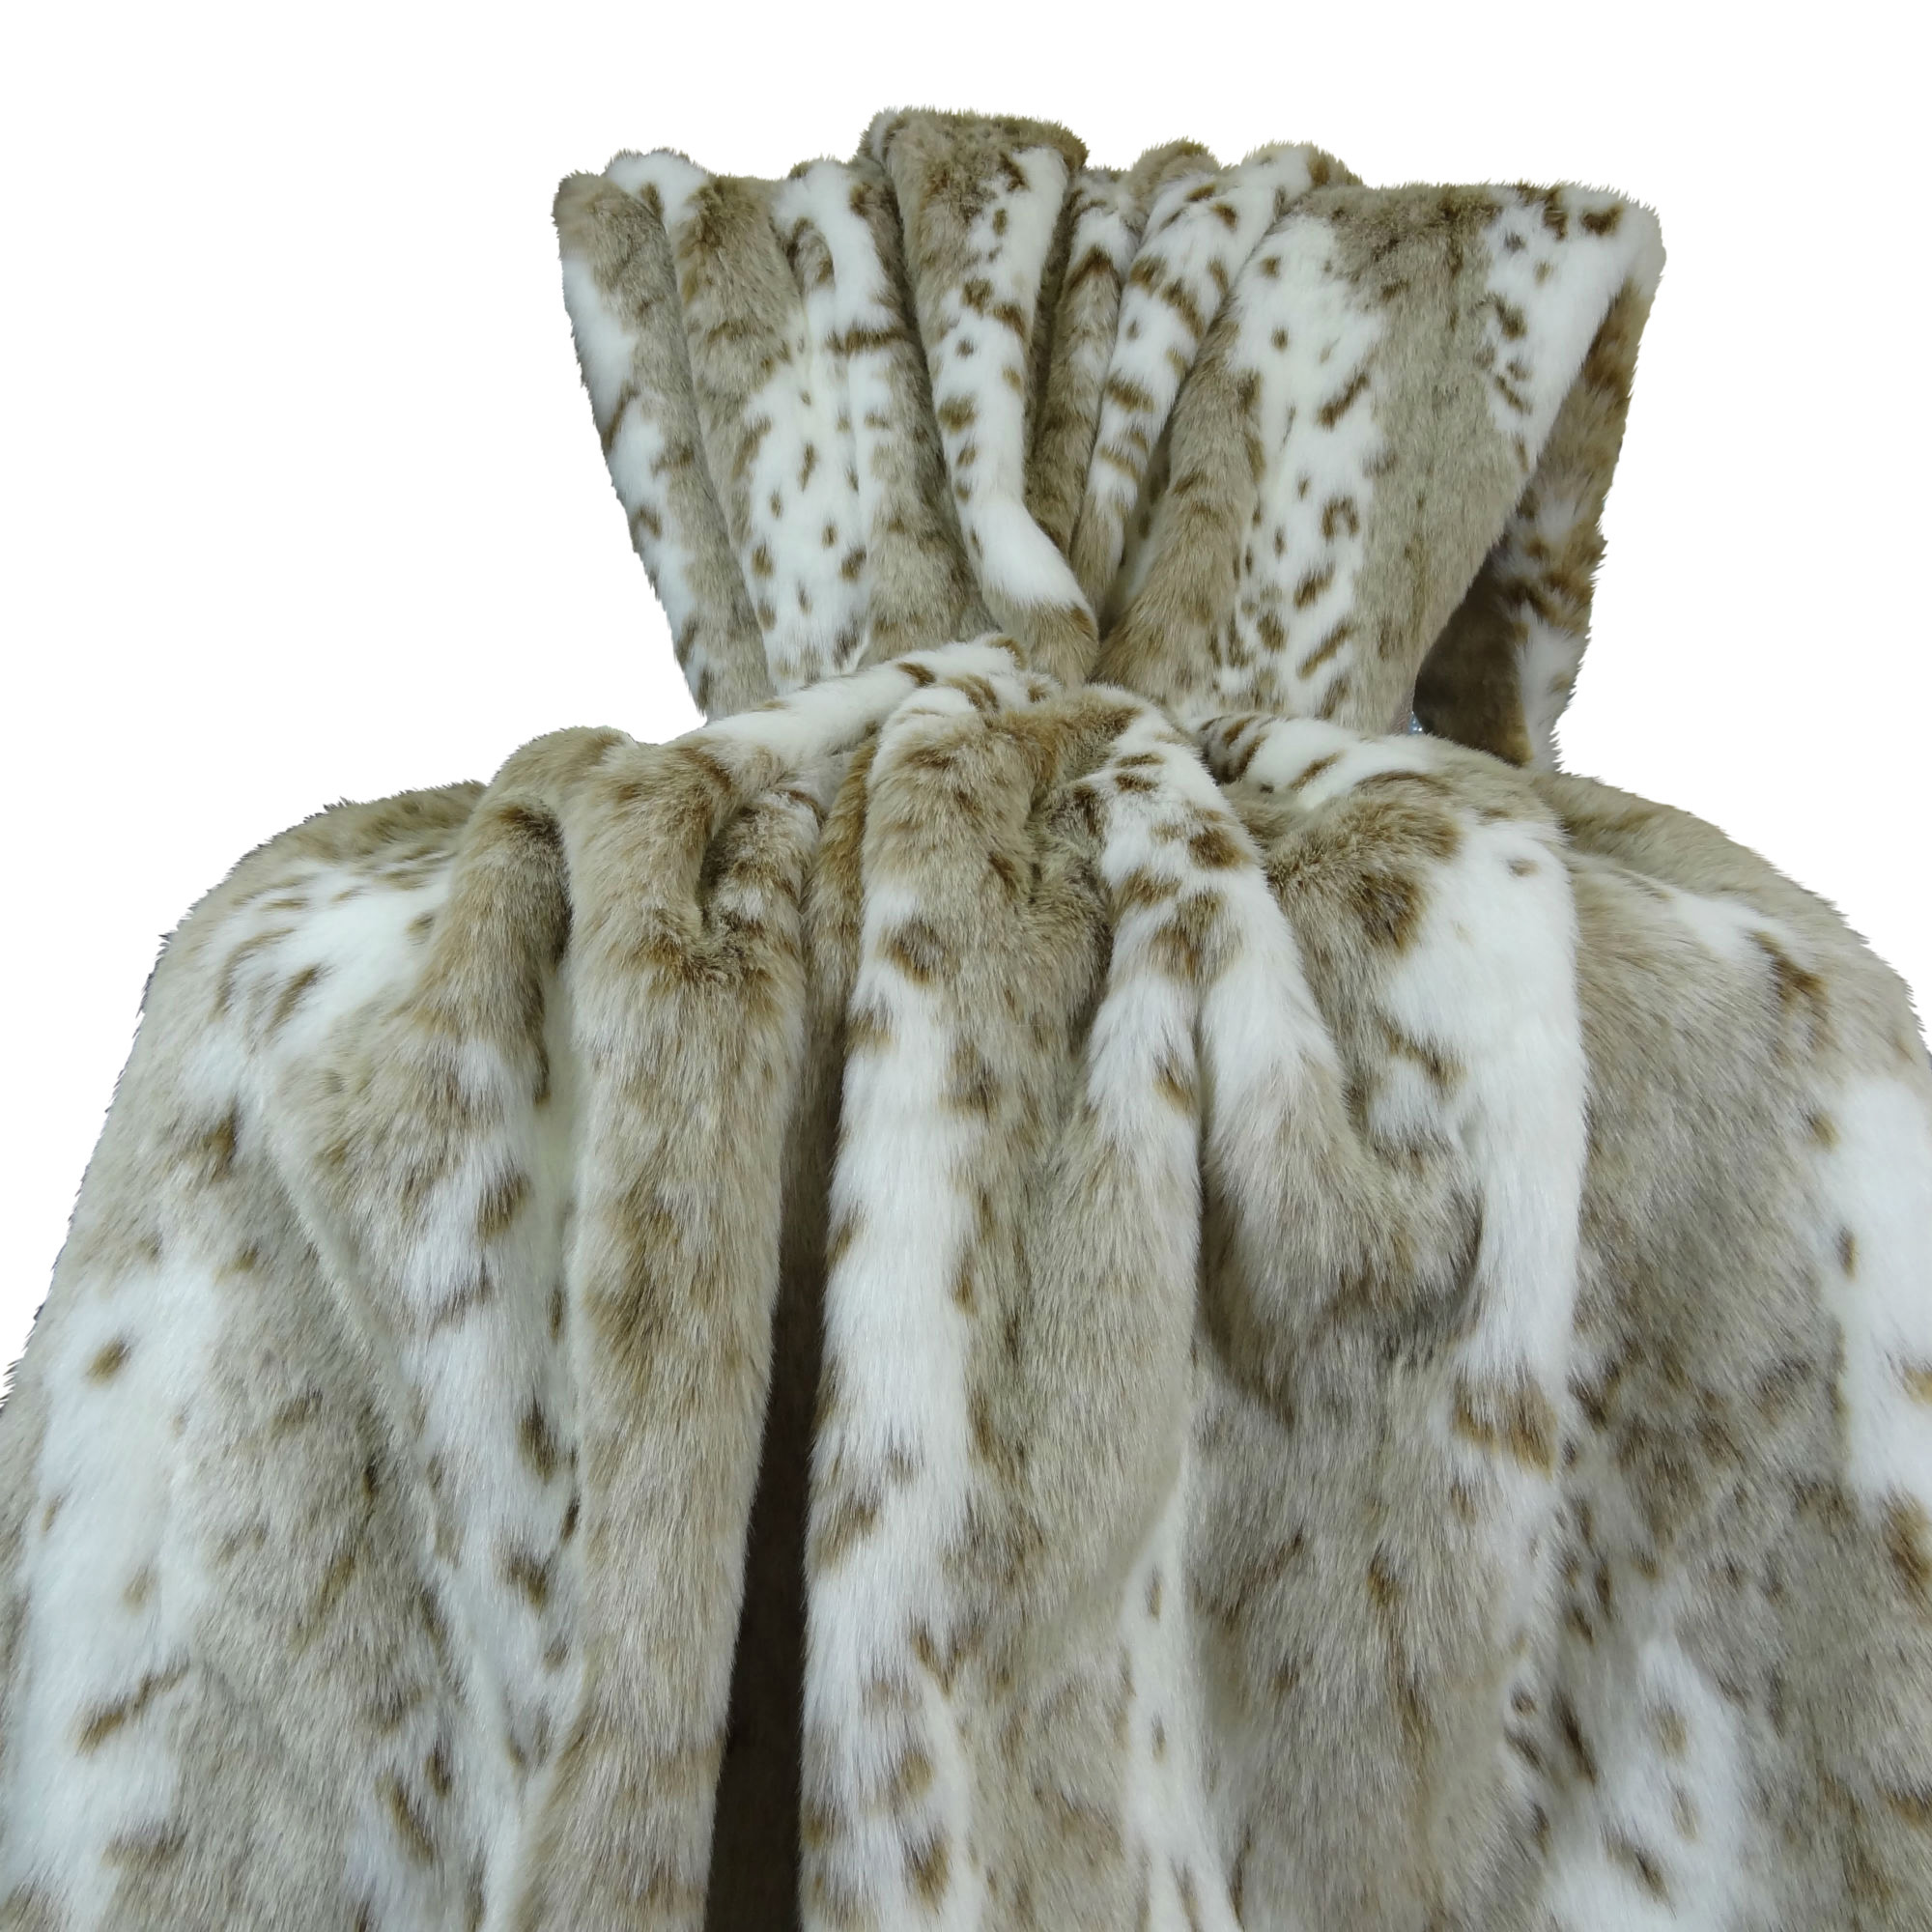 Plutus Siberian Leopard Handmade Throw / Blanket,Siberian Leopard